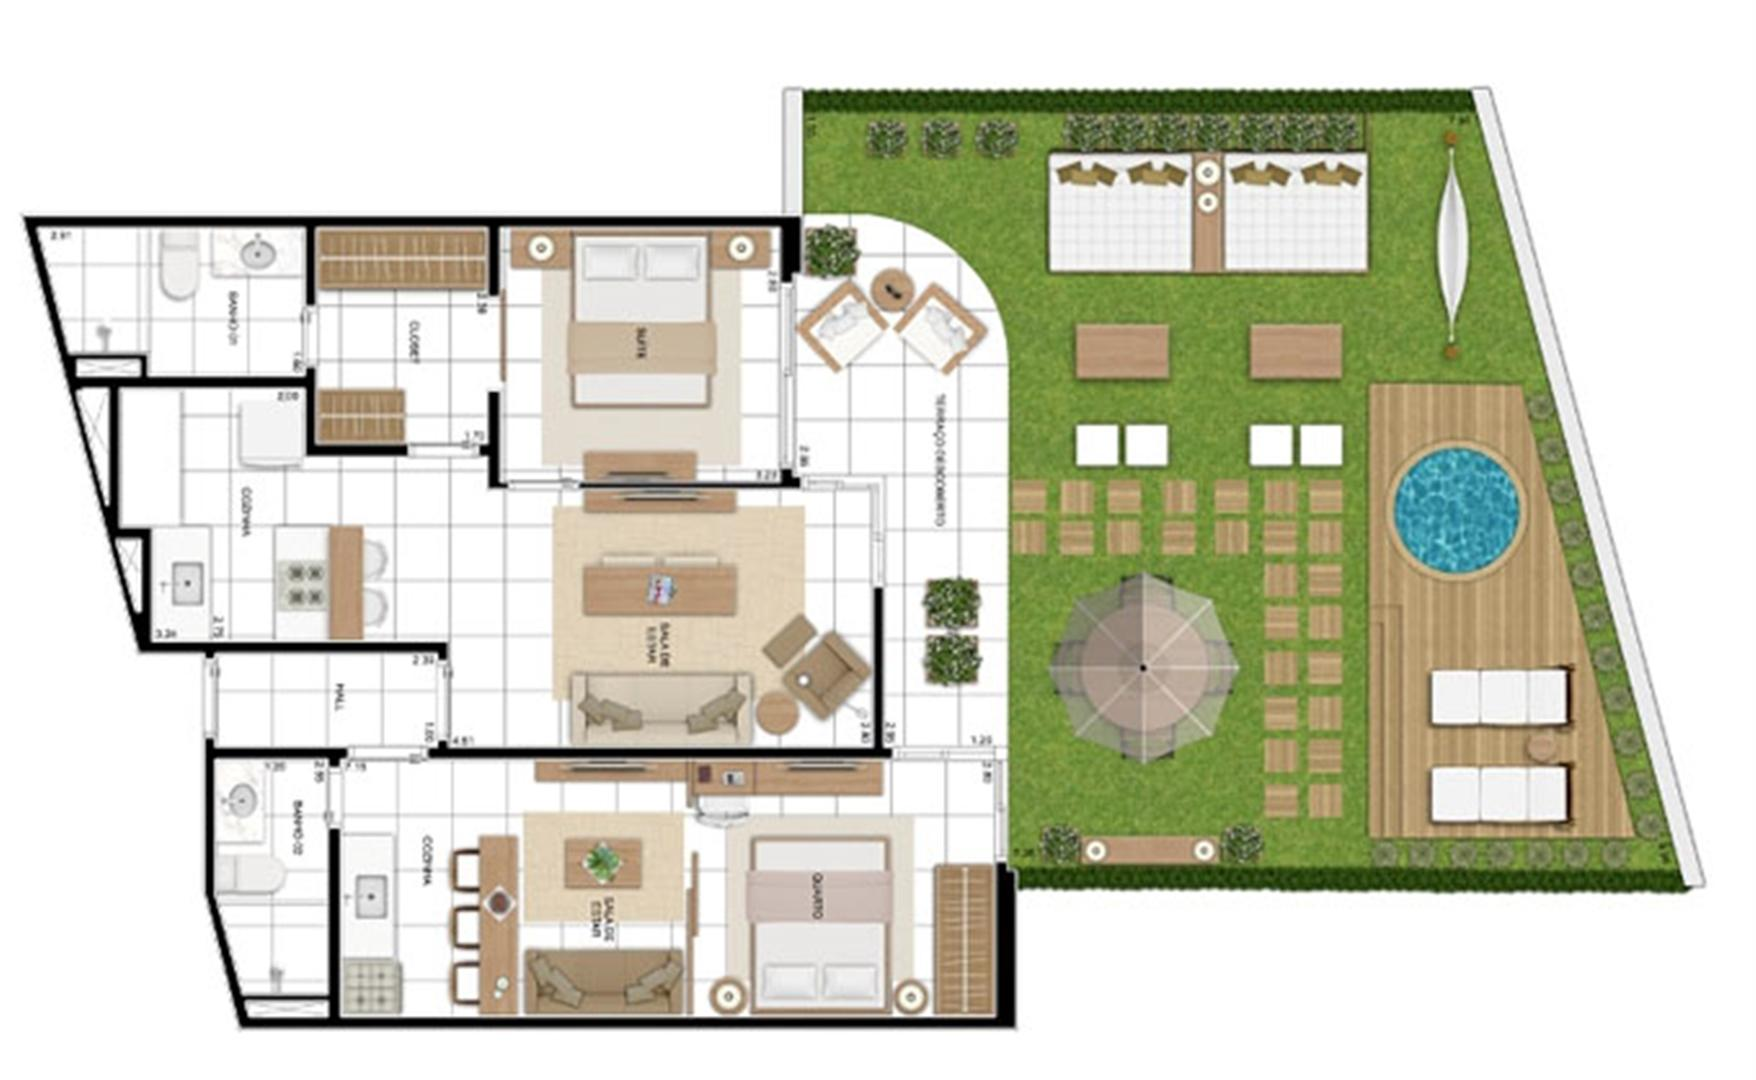 PLANTA - APTO TIPO A - MAISON 137 m²  | In Mare Bali – Apartamento no  Distrito Litoral de Cotovelo - Parnamirim - Rio Grande do Norte